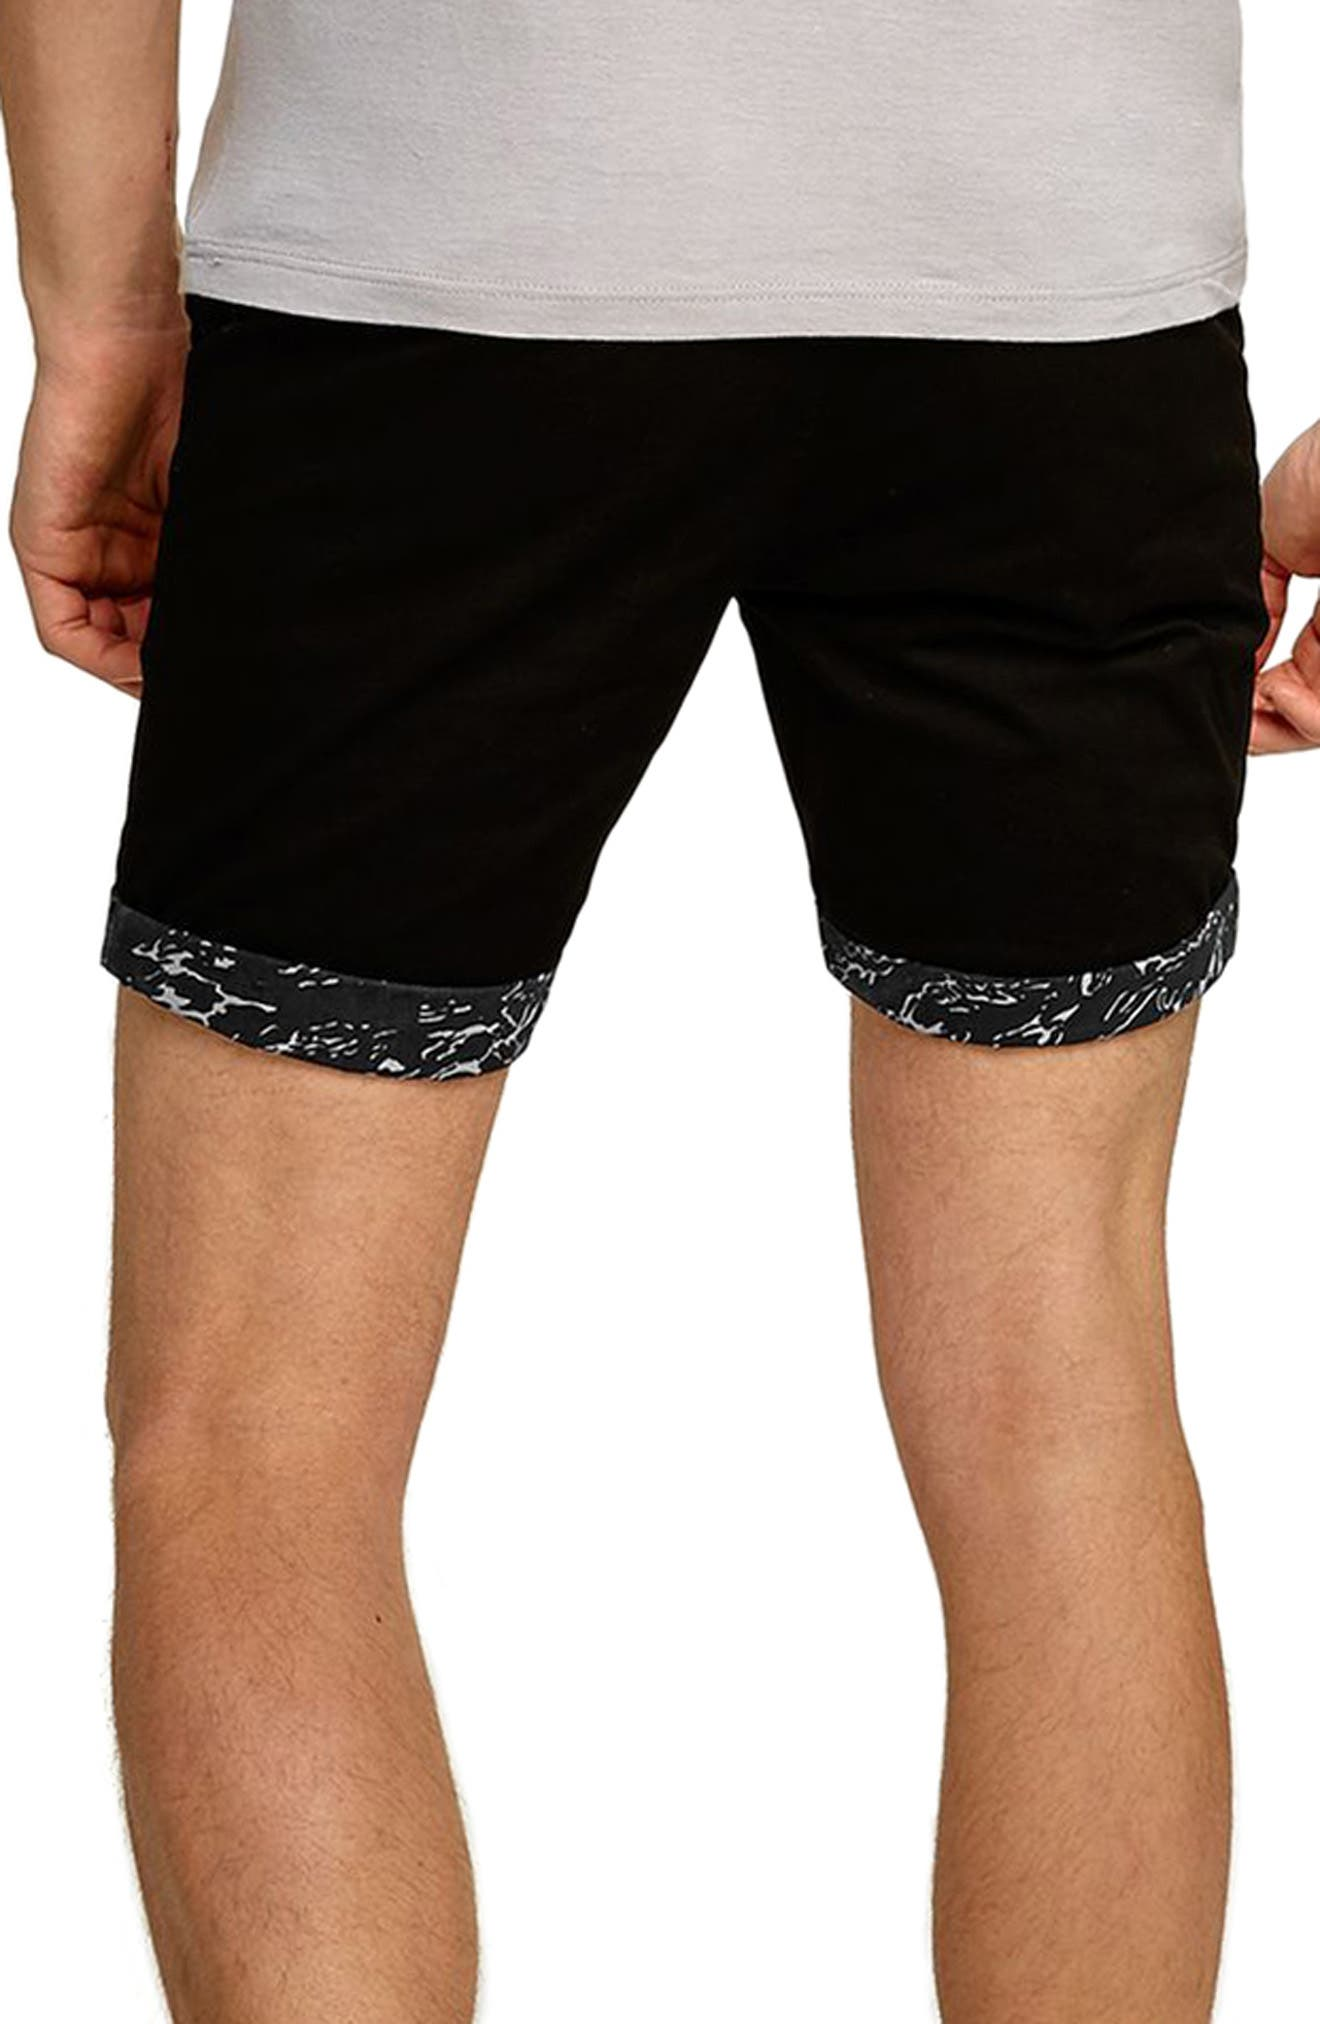 Stretch Skinny Fit Chino Shorts,                             Alternate thumbnail 2, color,                             Black Multi